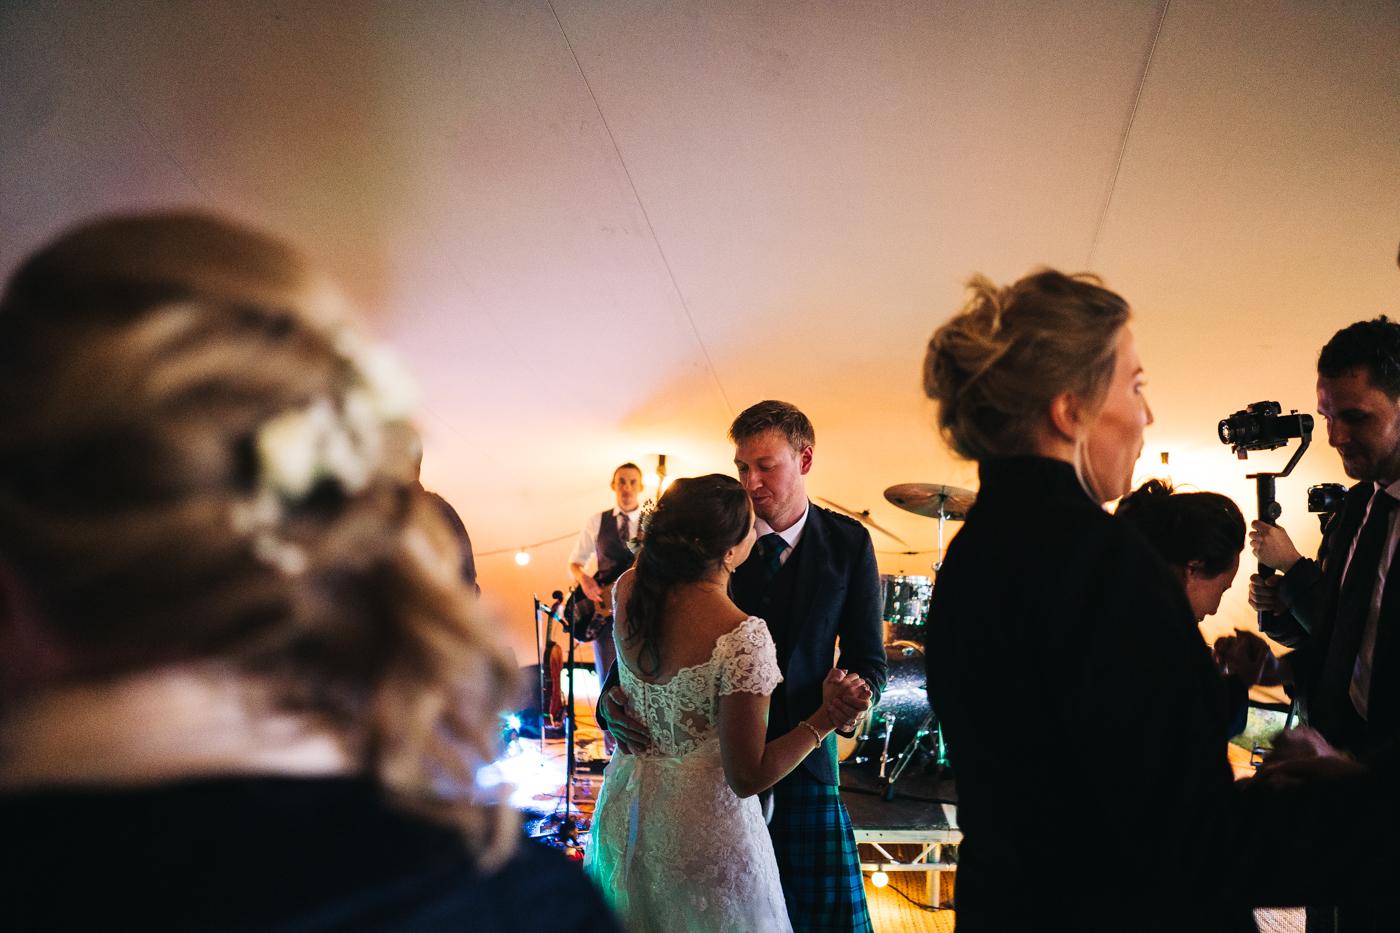 scottish-wedding-trossachs-loch-tay-highlannds-relaxed-photography-photographer-0049.jpg